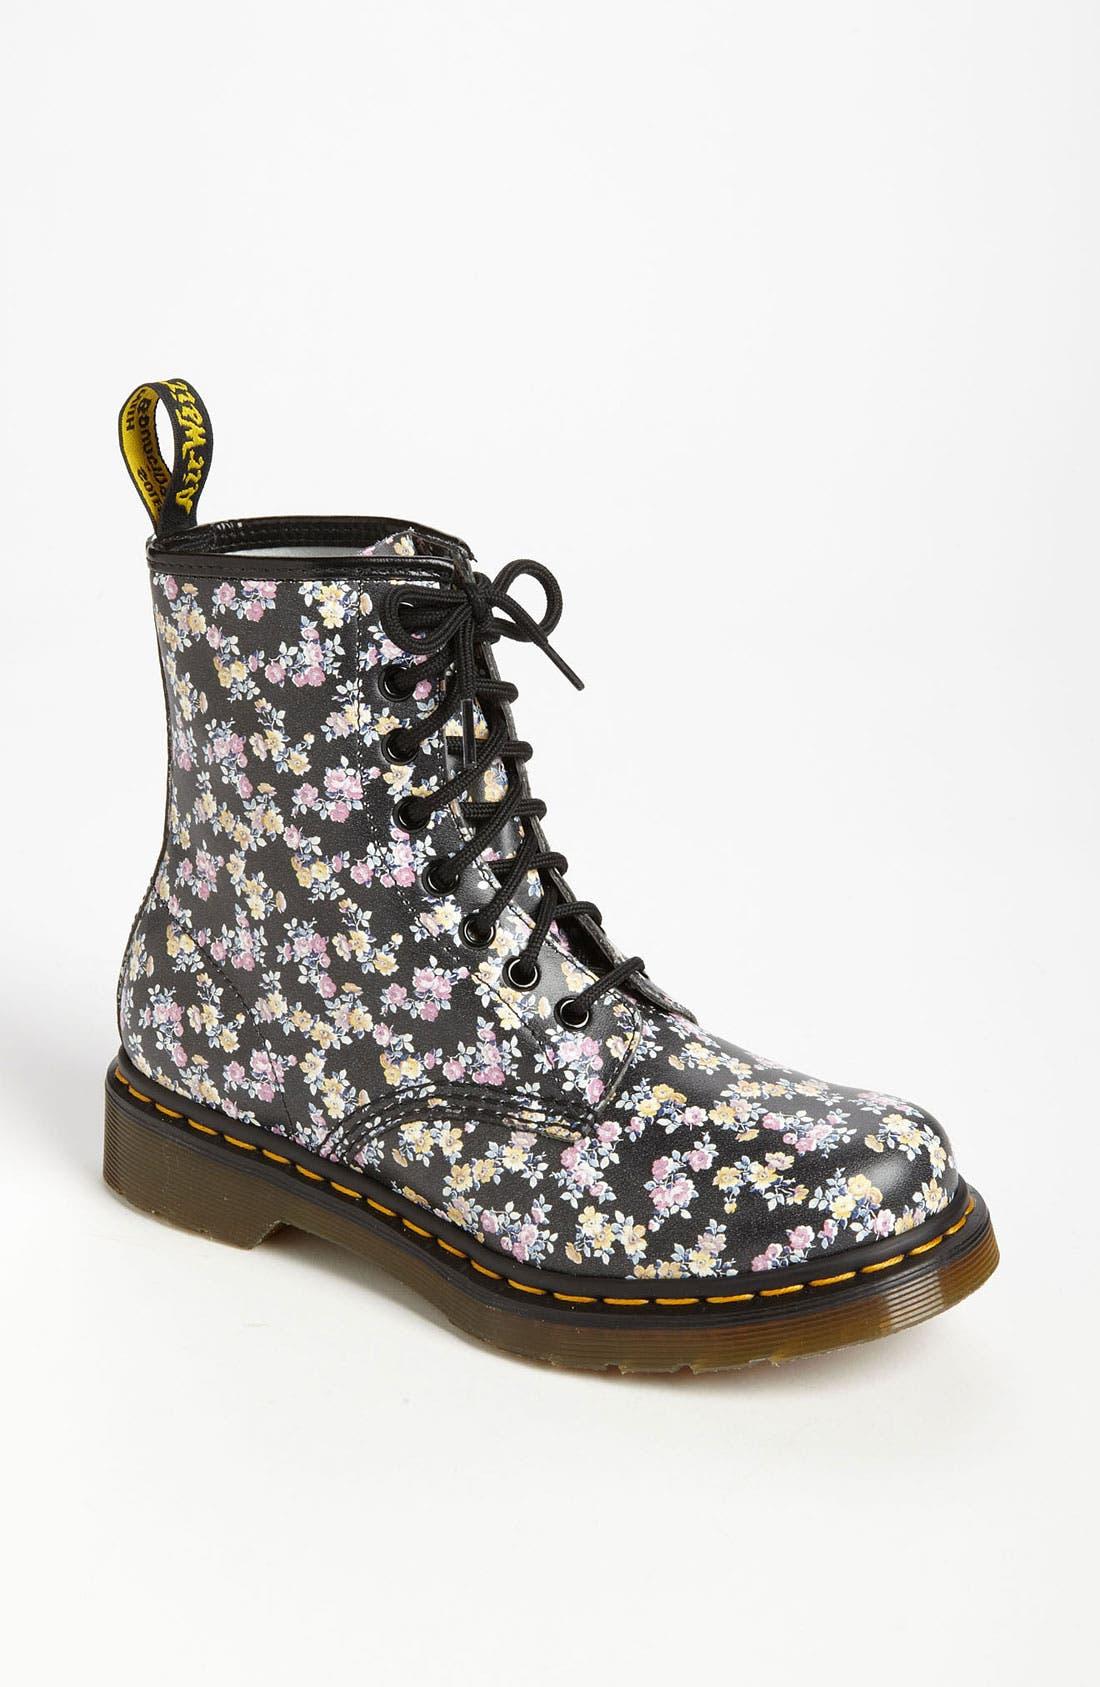 Alternate Image 1 Selected - Dr. Martens 'Mini Tydee' Boot (Women)